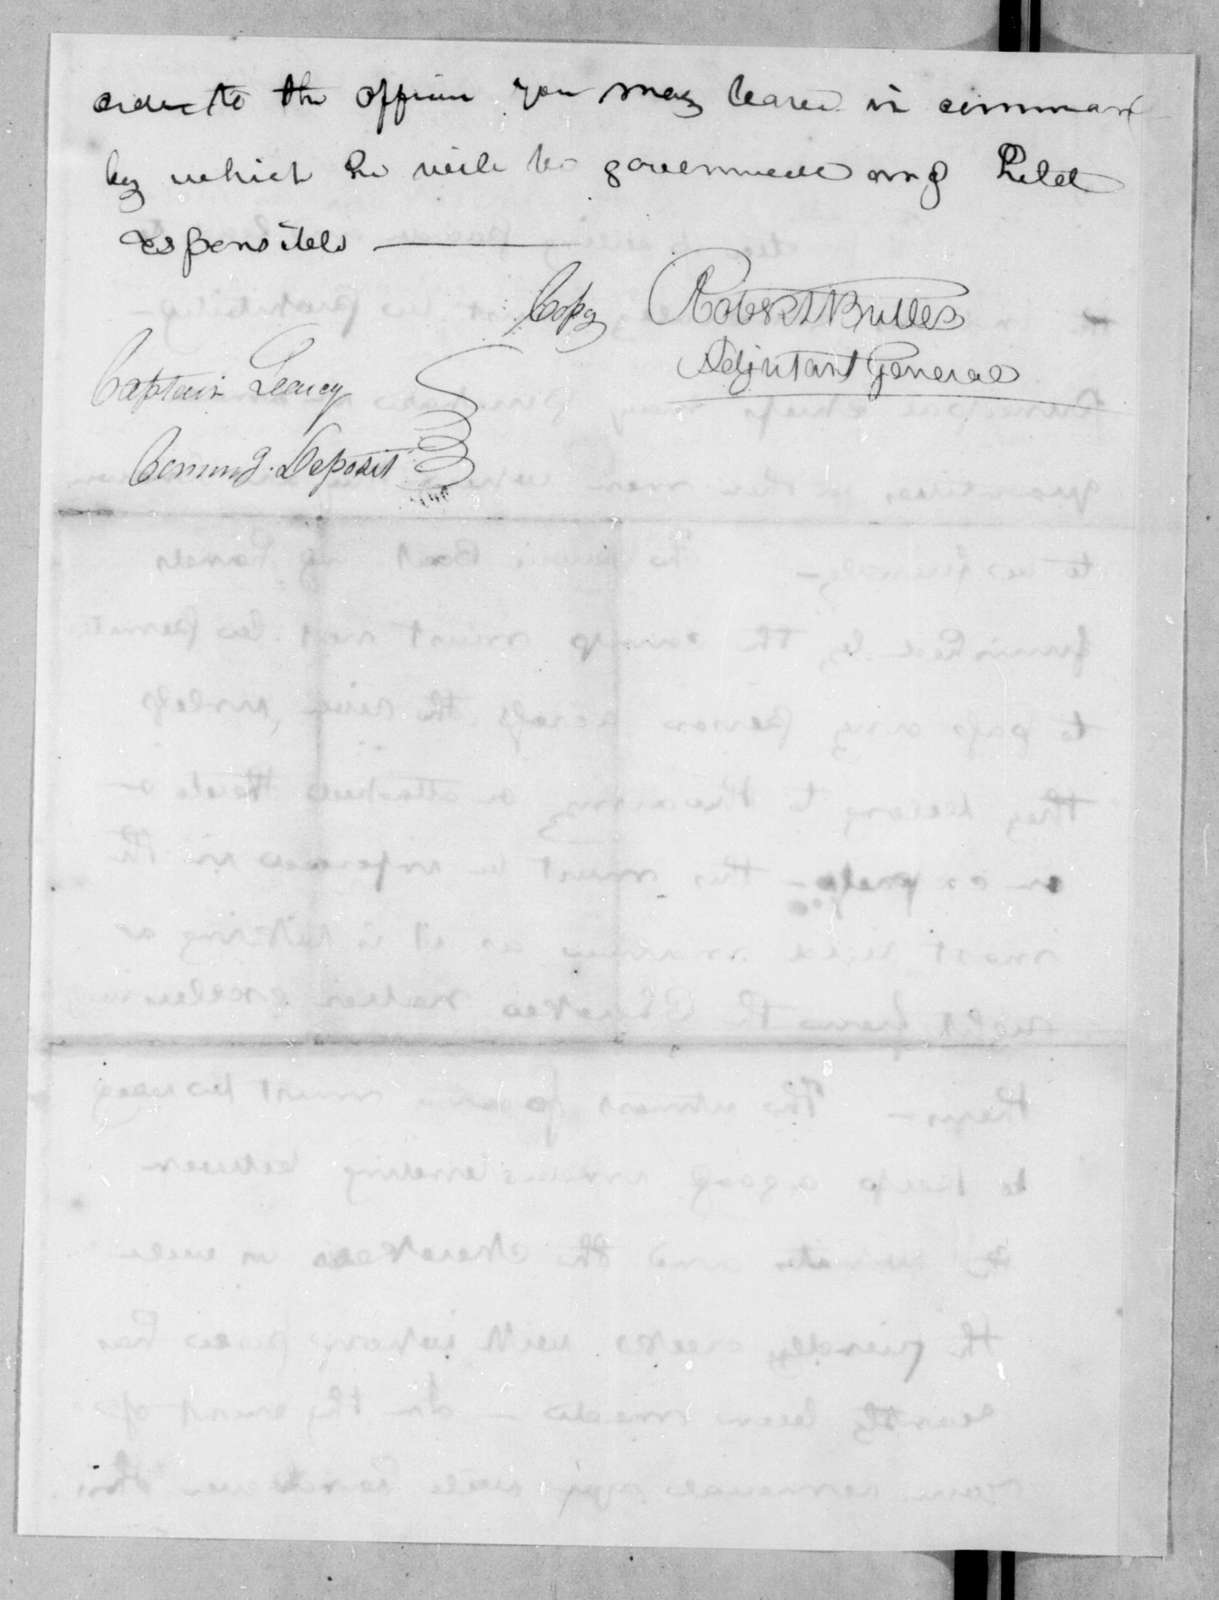 Evert Bogardus to Richard Sparks, August 15, 1814